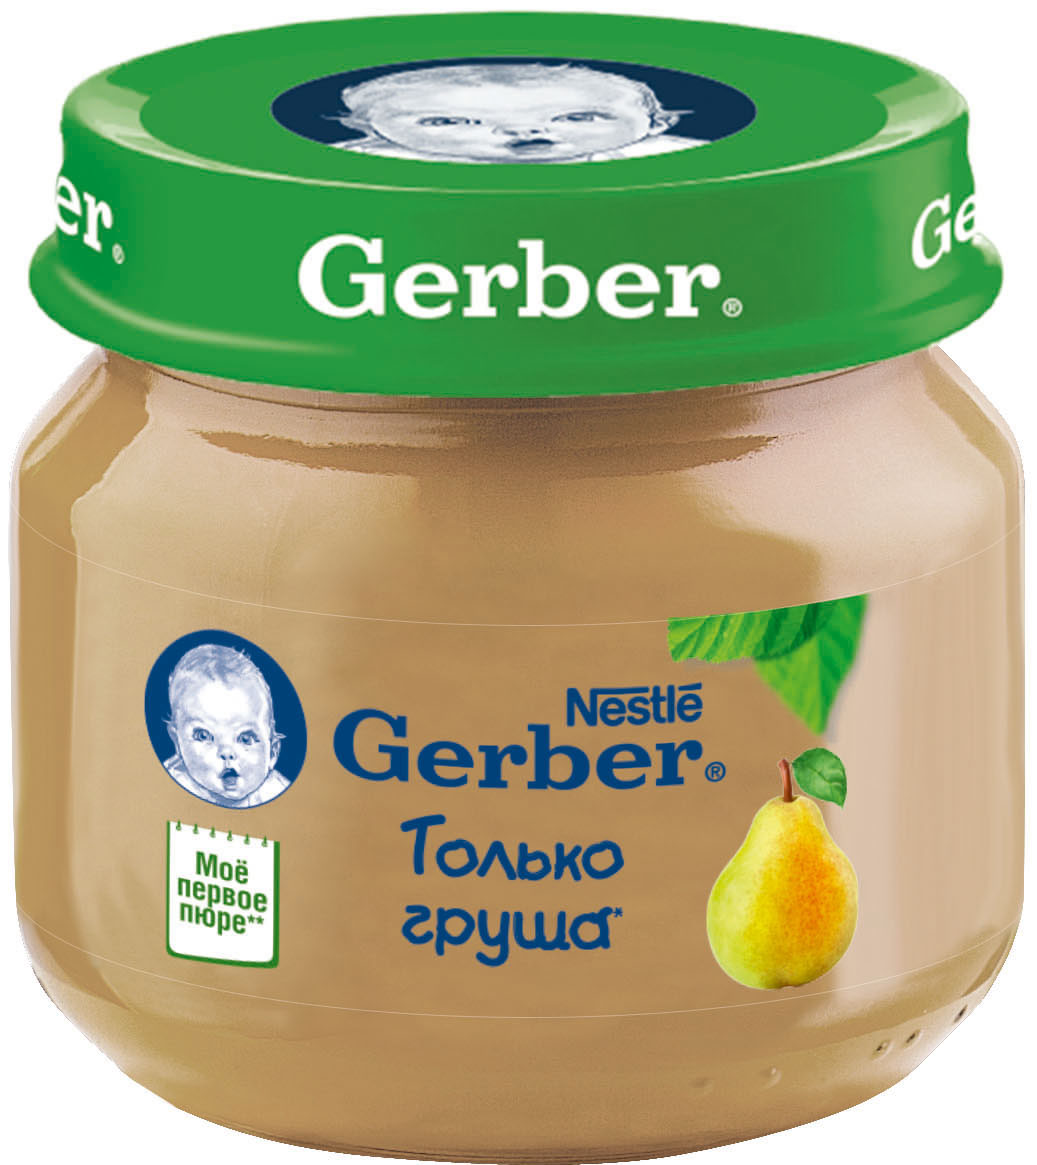 Пюре Gerber Gerber Только груша (с 4 месяцев) 80 г gerber пюре цветная капуста с 4 месяцев 12 шт по 80 г